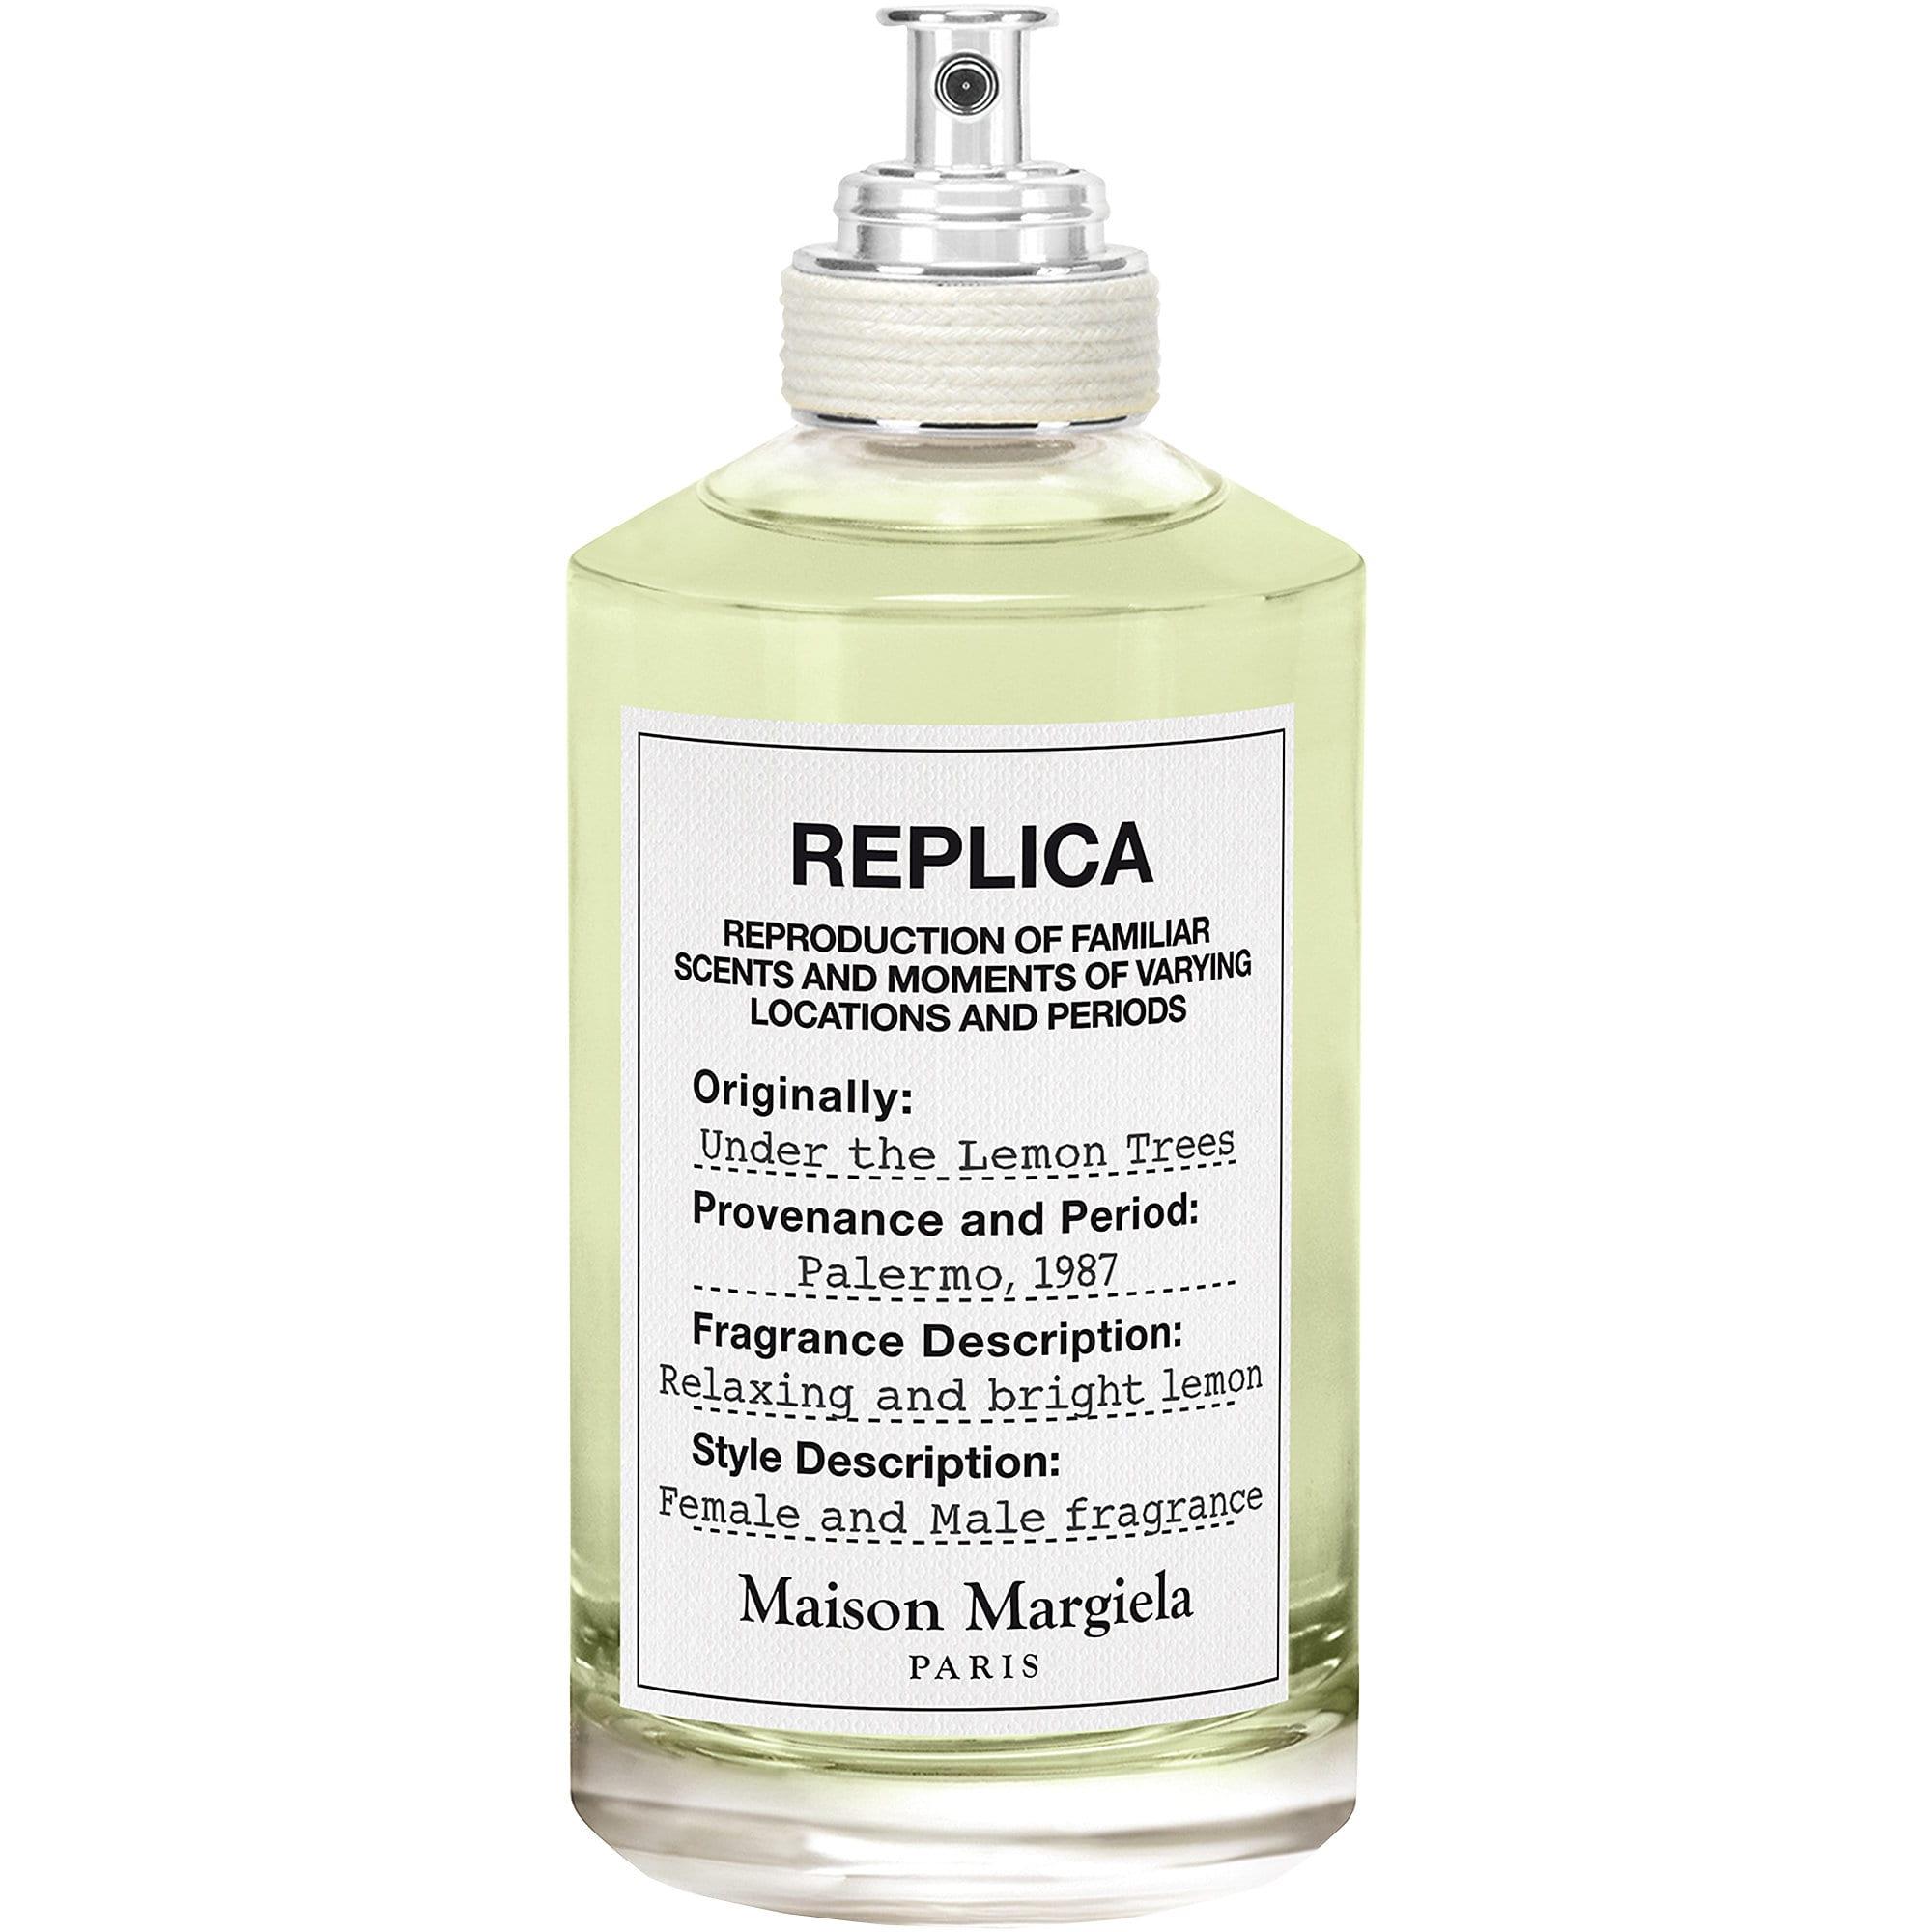 REPLICA Under the Lemon Trees  $158